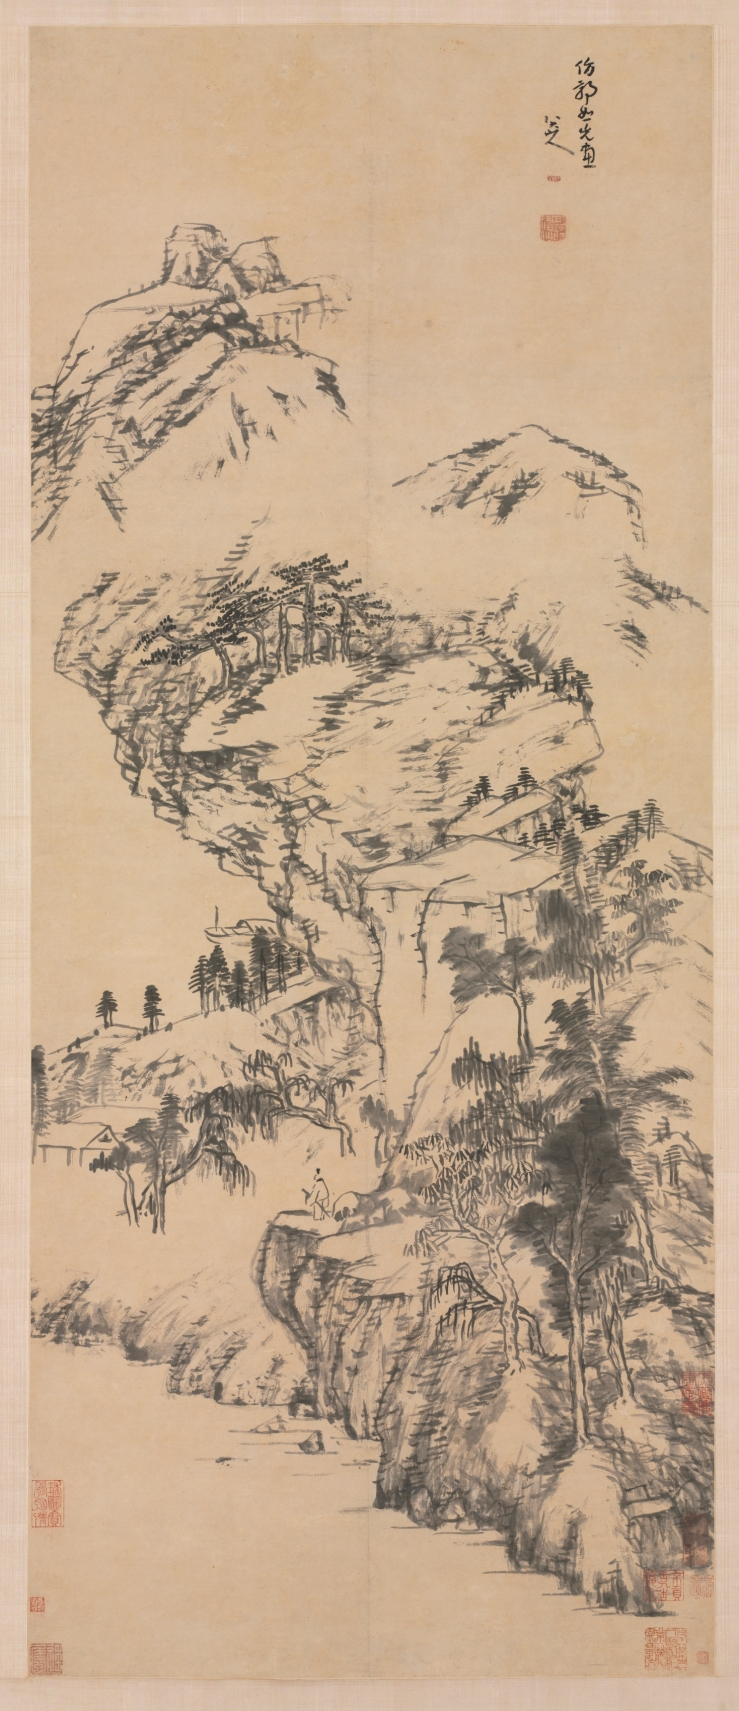 236 1955.36 chu ta landscape after kuo chung-shu 17c ch'ing.jpg